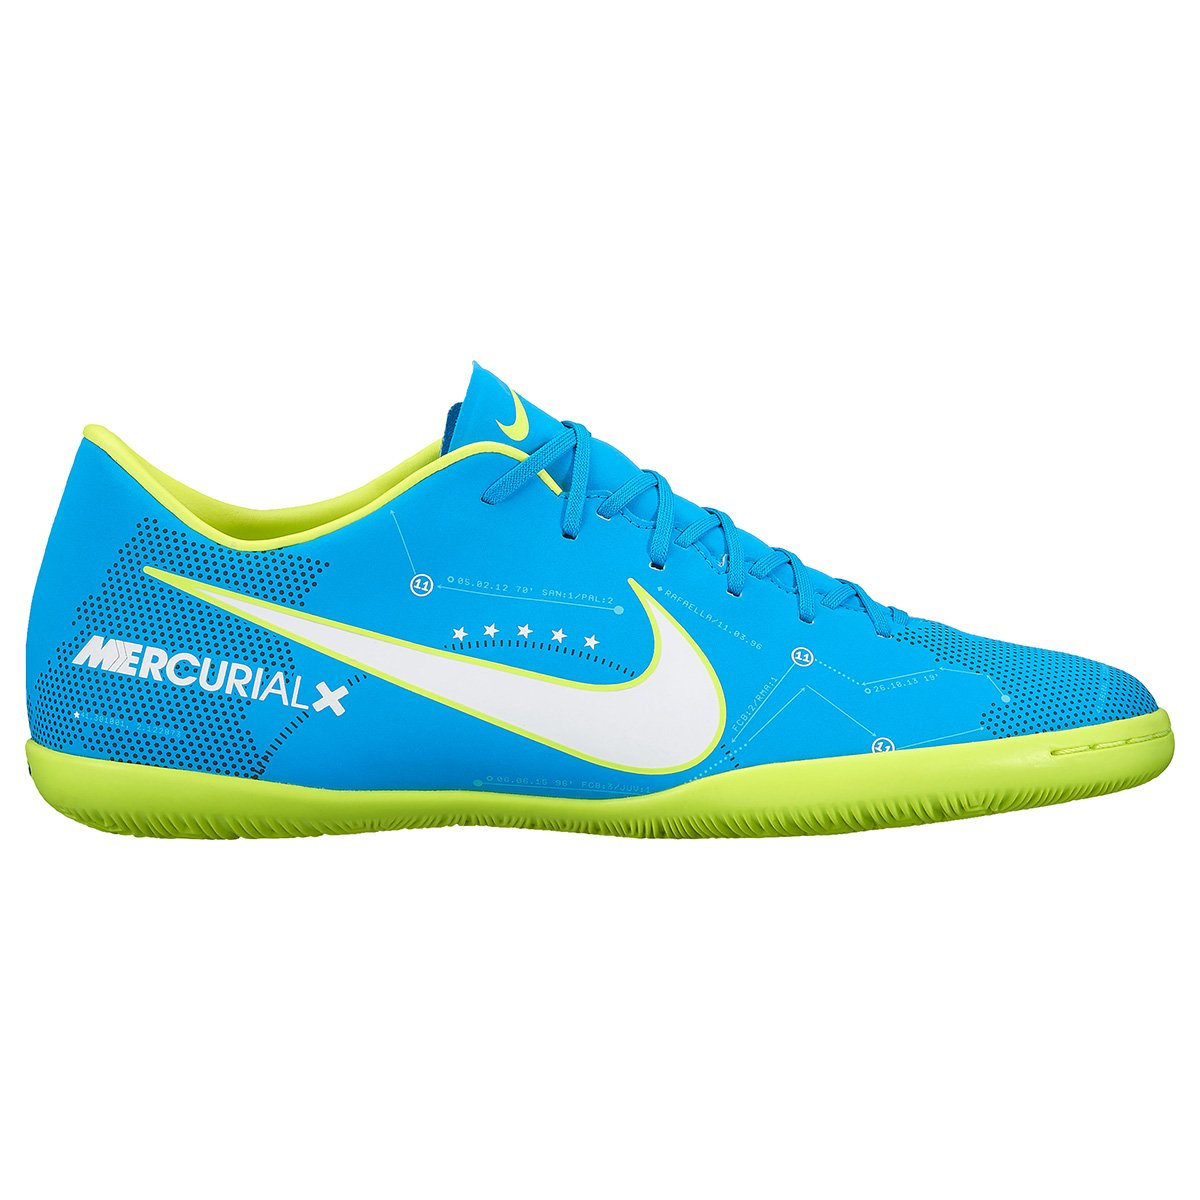 d77d76393 Chuteira Futsal Nike Mercurial Victory 6 Neymar Jr IC